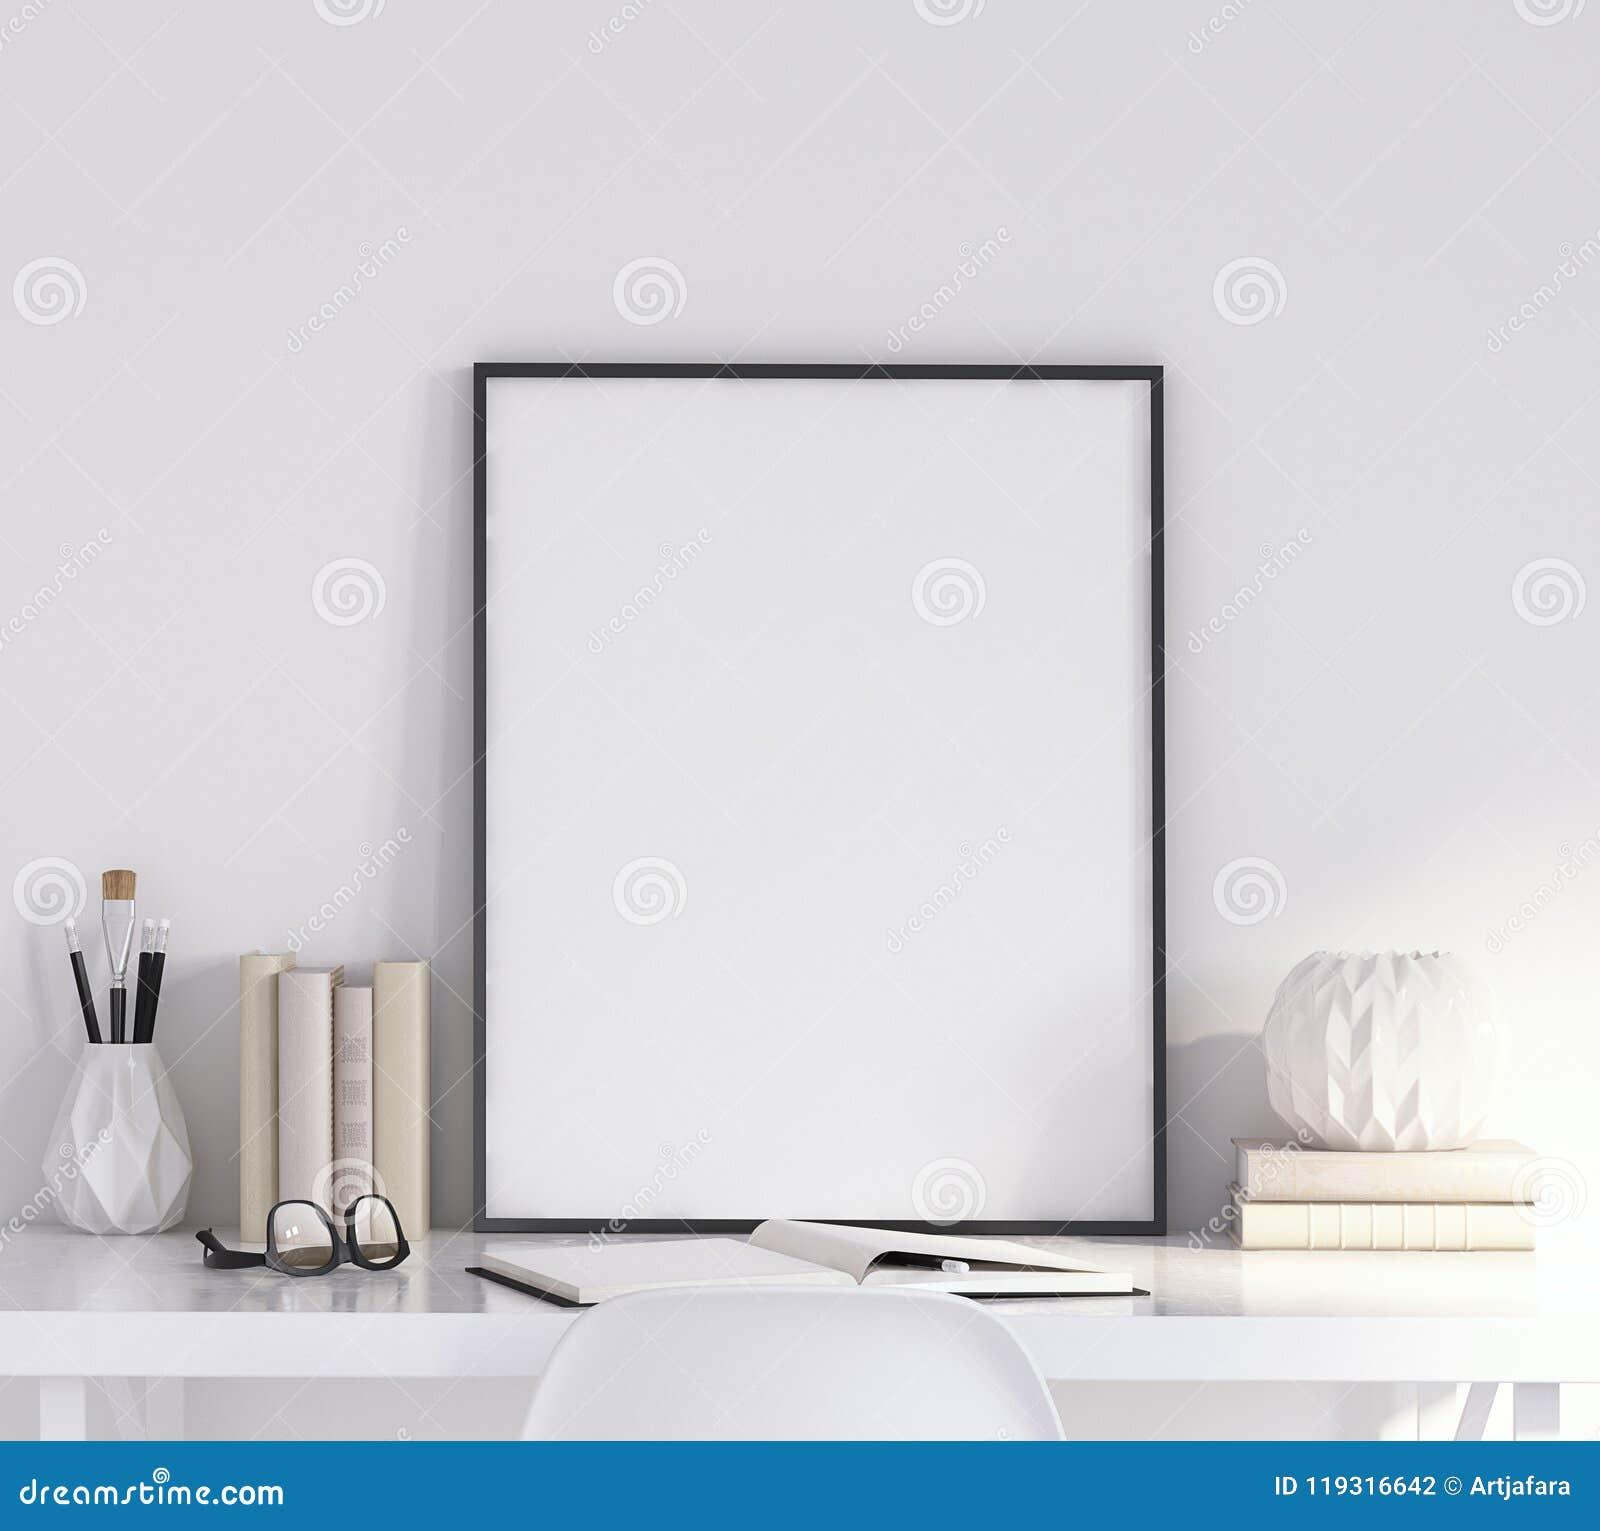 Spot op affichekader in woonkamer, werkplaats, Skandinavische stijl